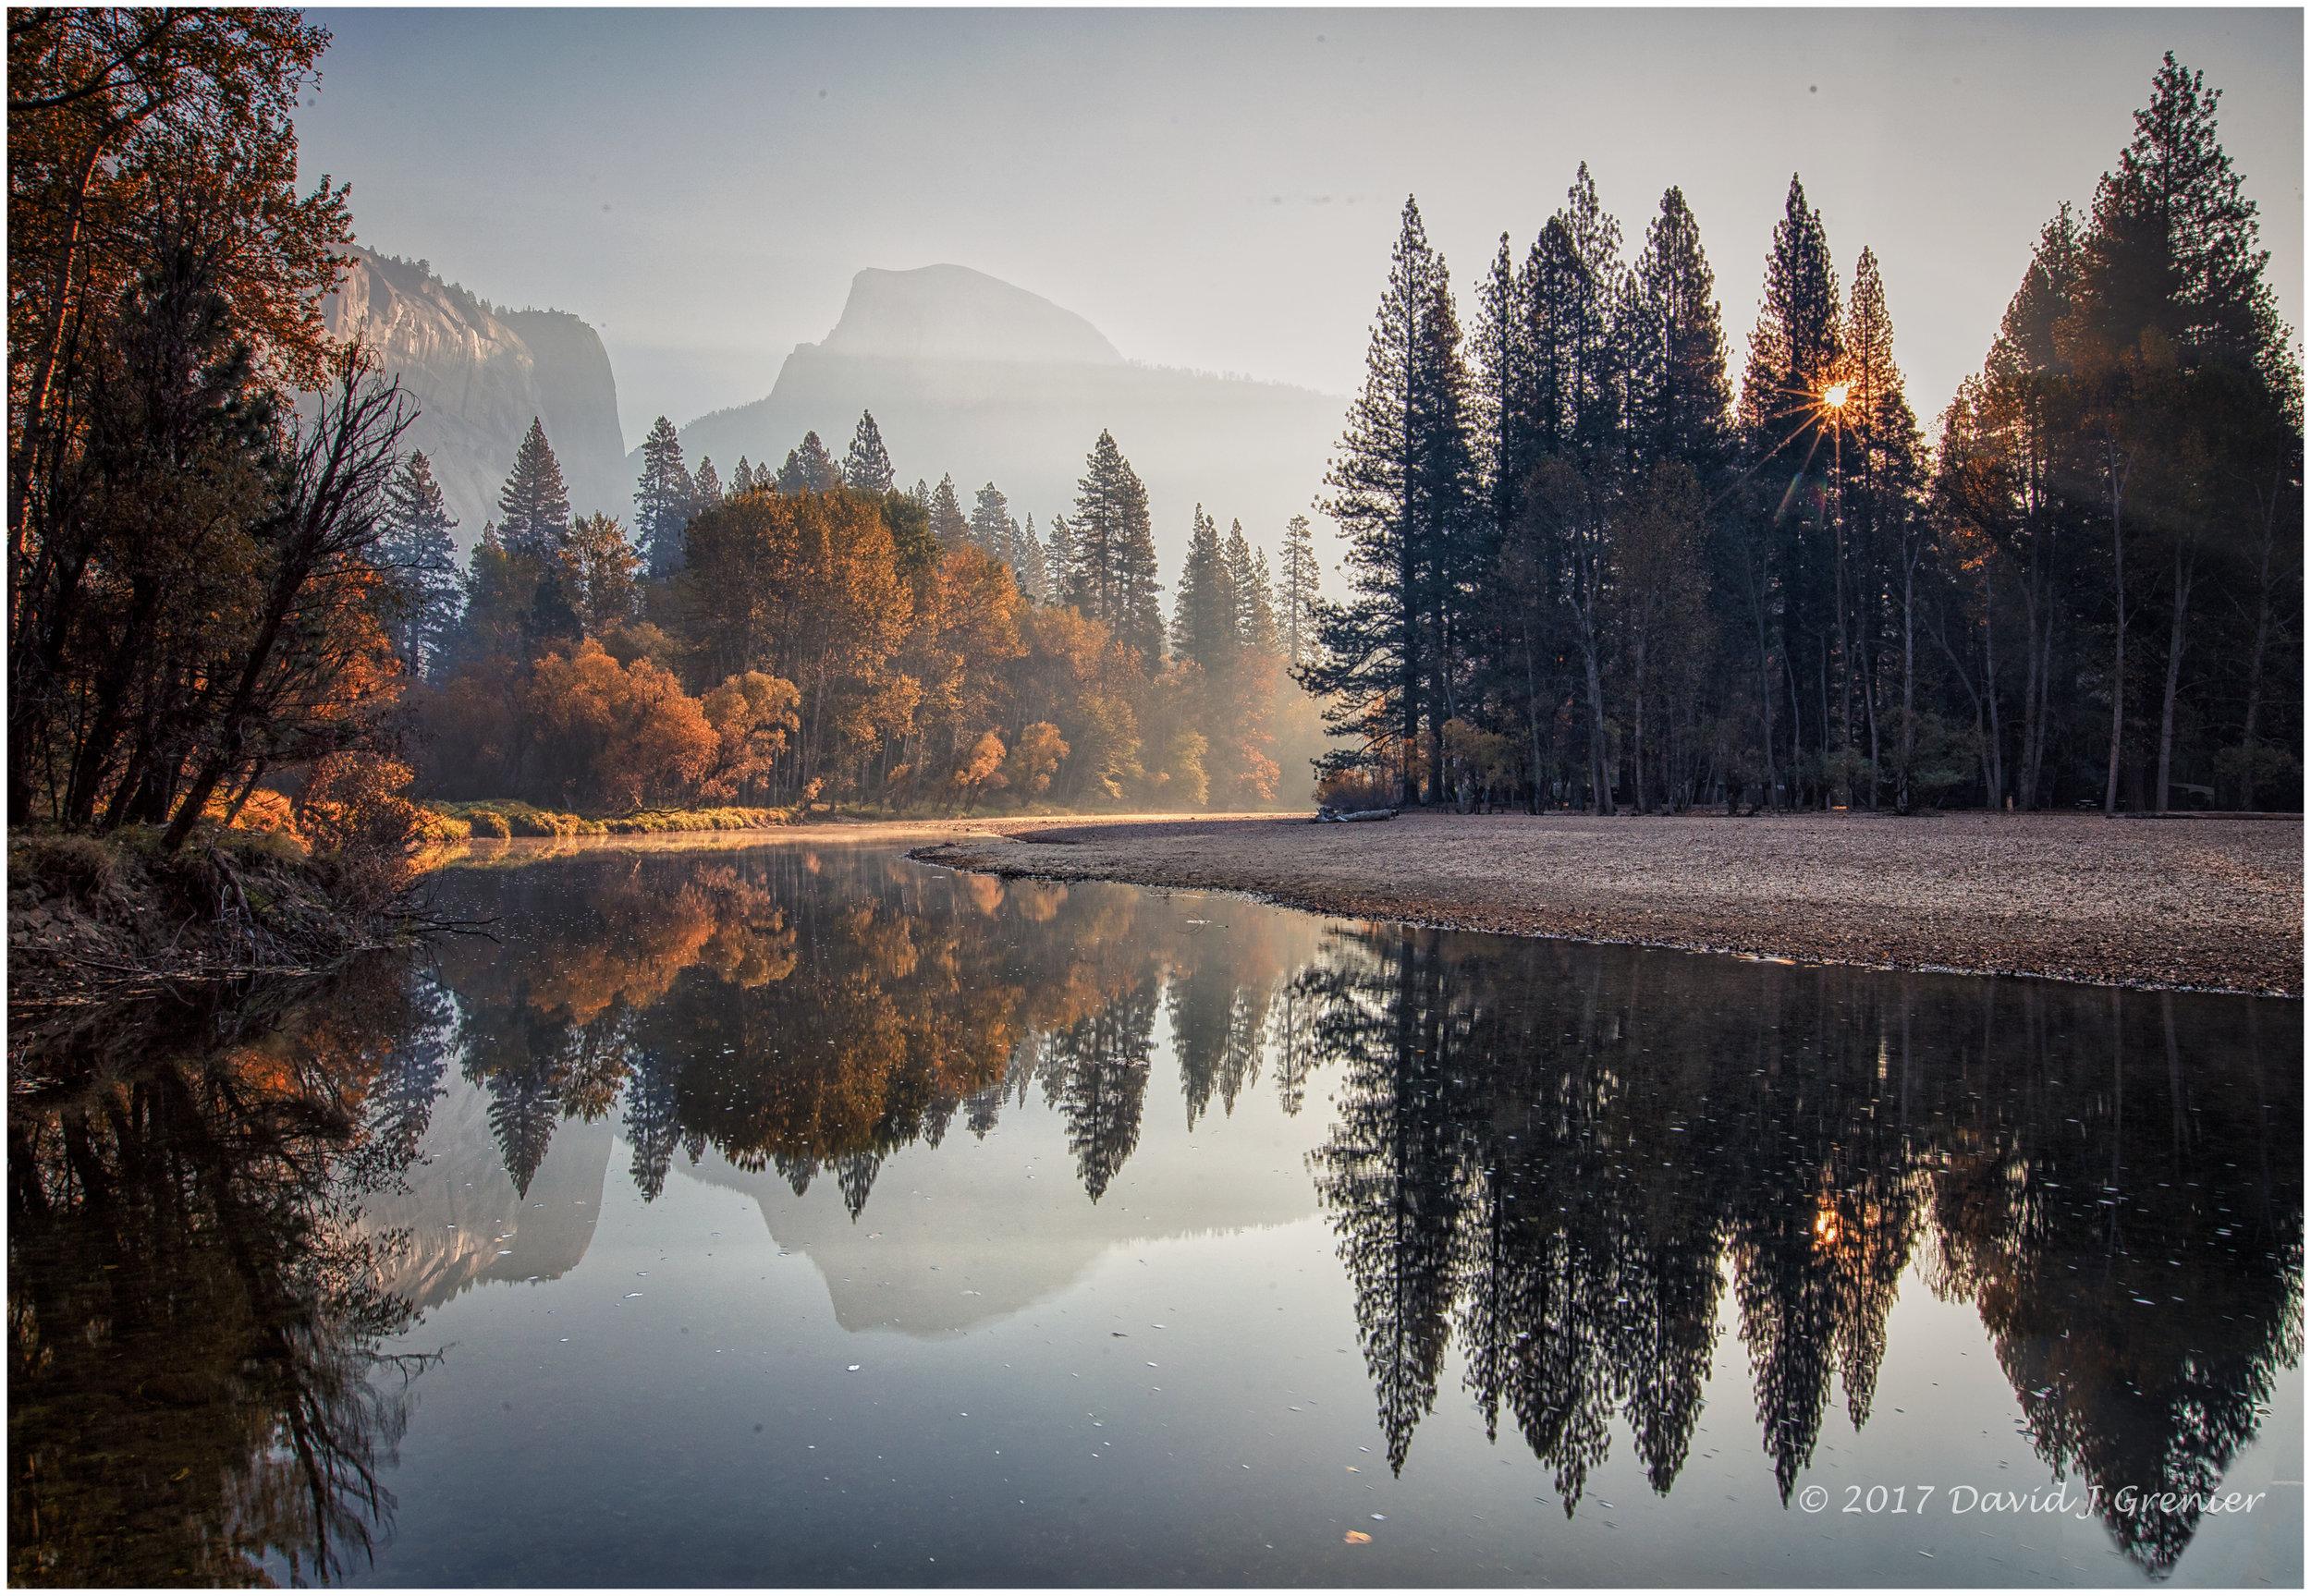 November 2, 2017, Yosemite National Park, CA; exp. 1/10 sec @ f/22; 16-35mm lens @ 16mm; ISO 100